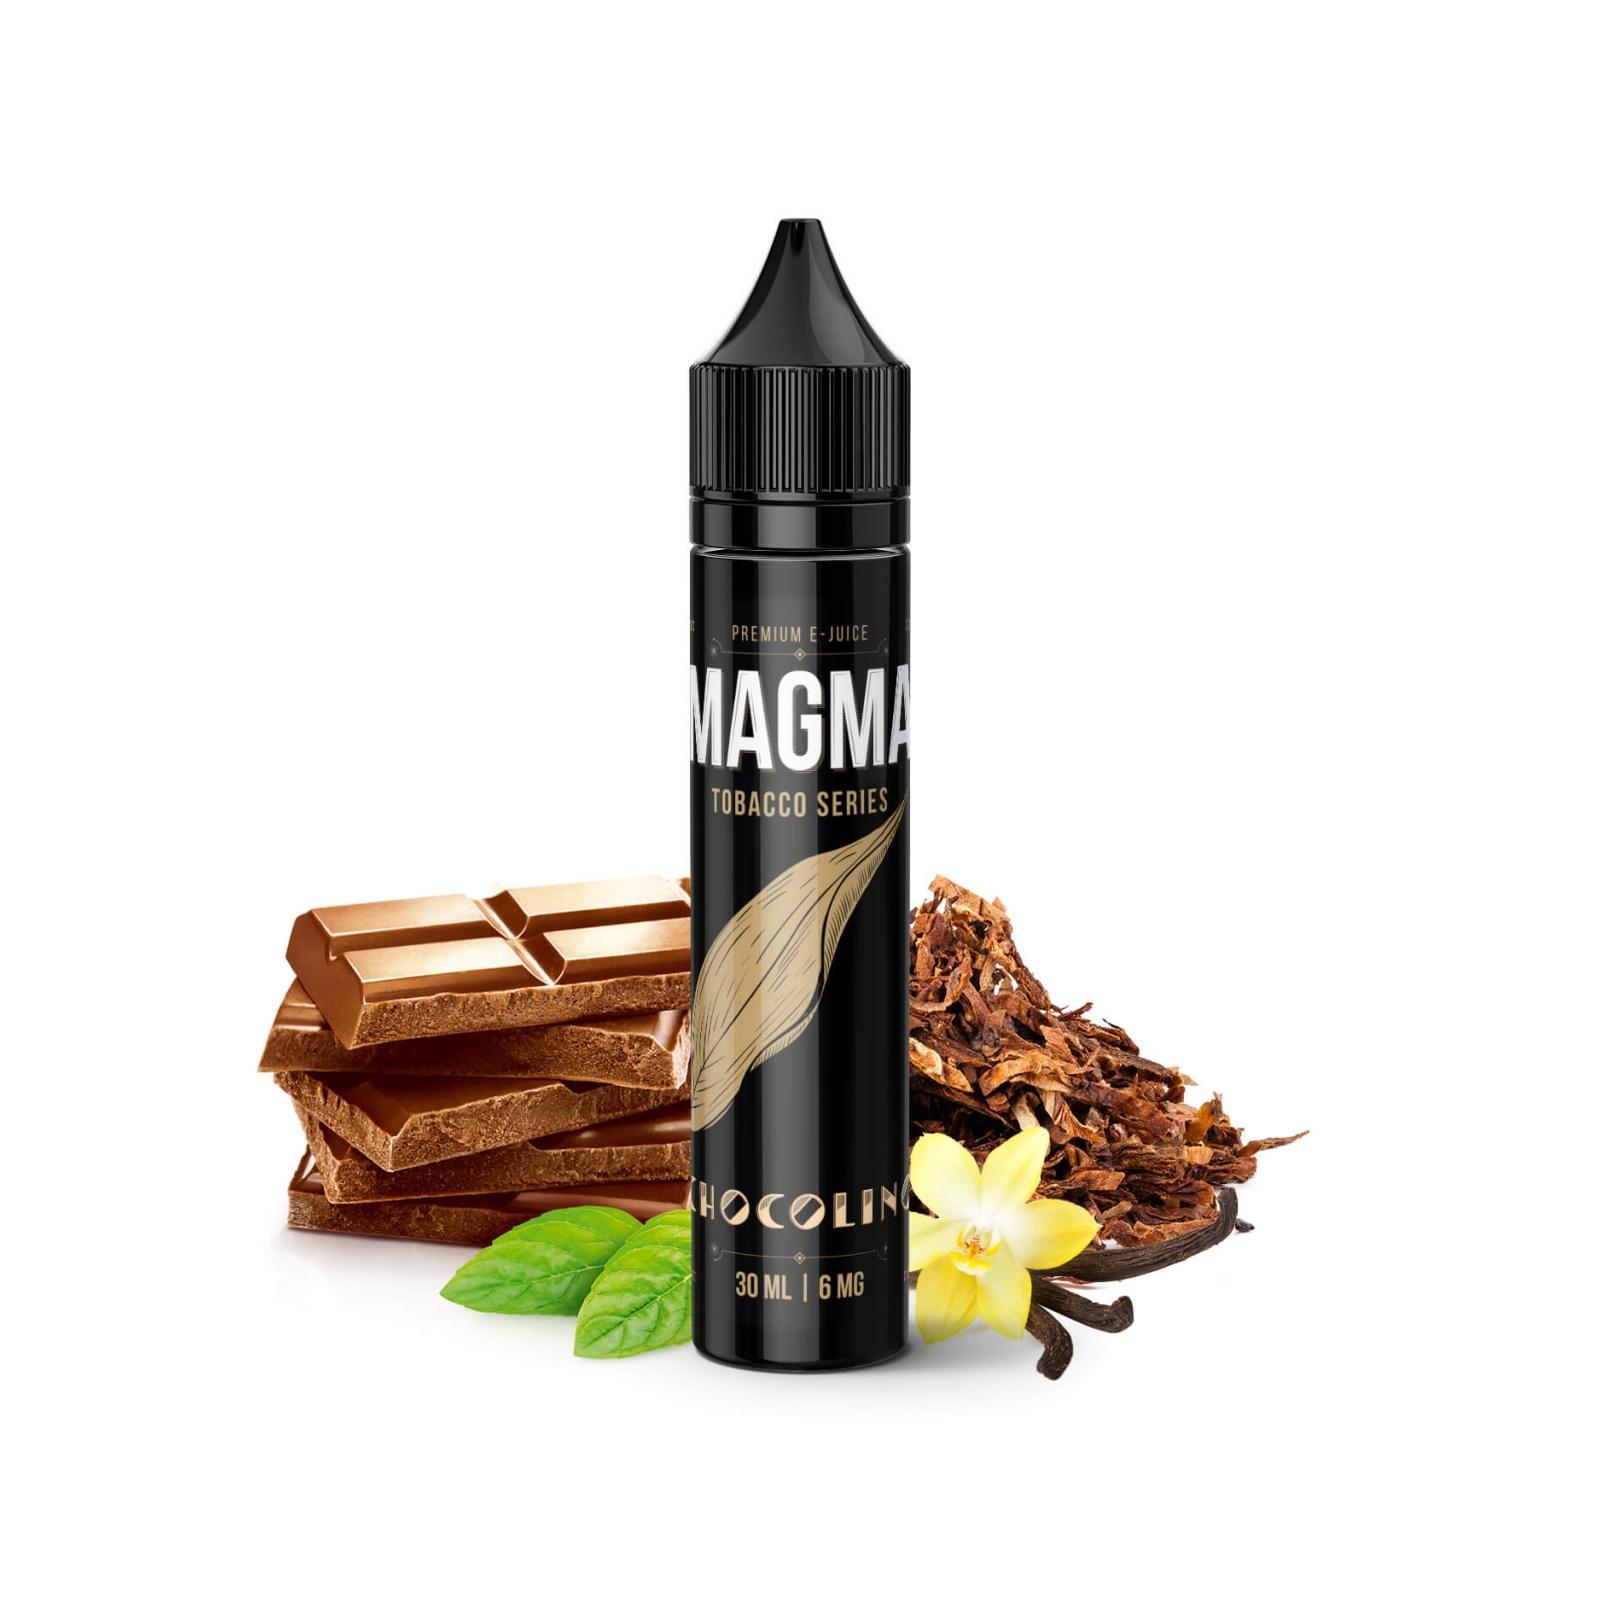 "Жидкость для электронных сигарет Magma ""Chocolino"" Tobacco Series 1.5 мг/мл 30 ml (MGM-CH-15)"